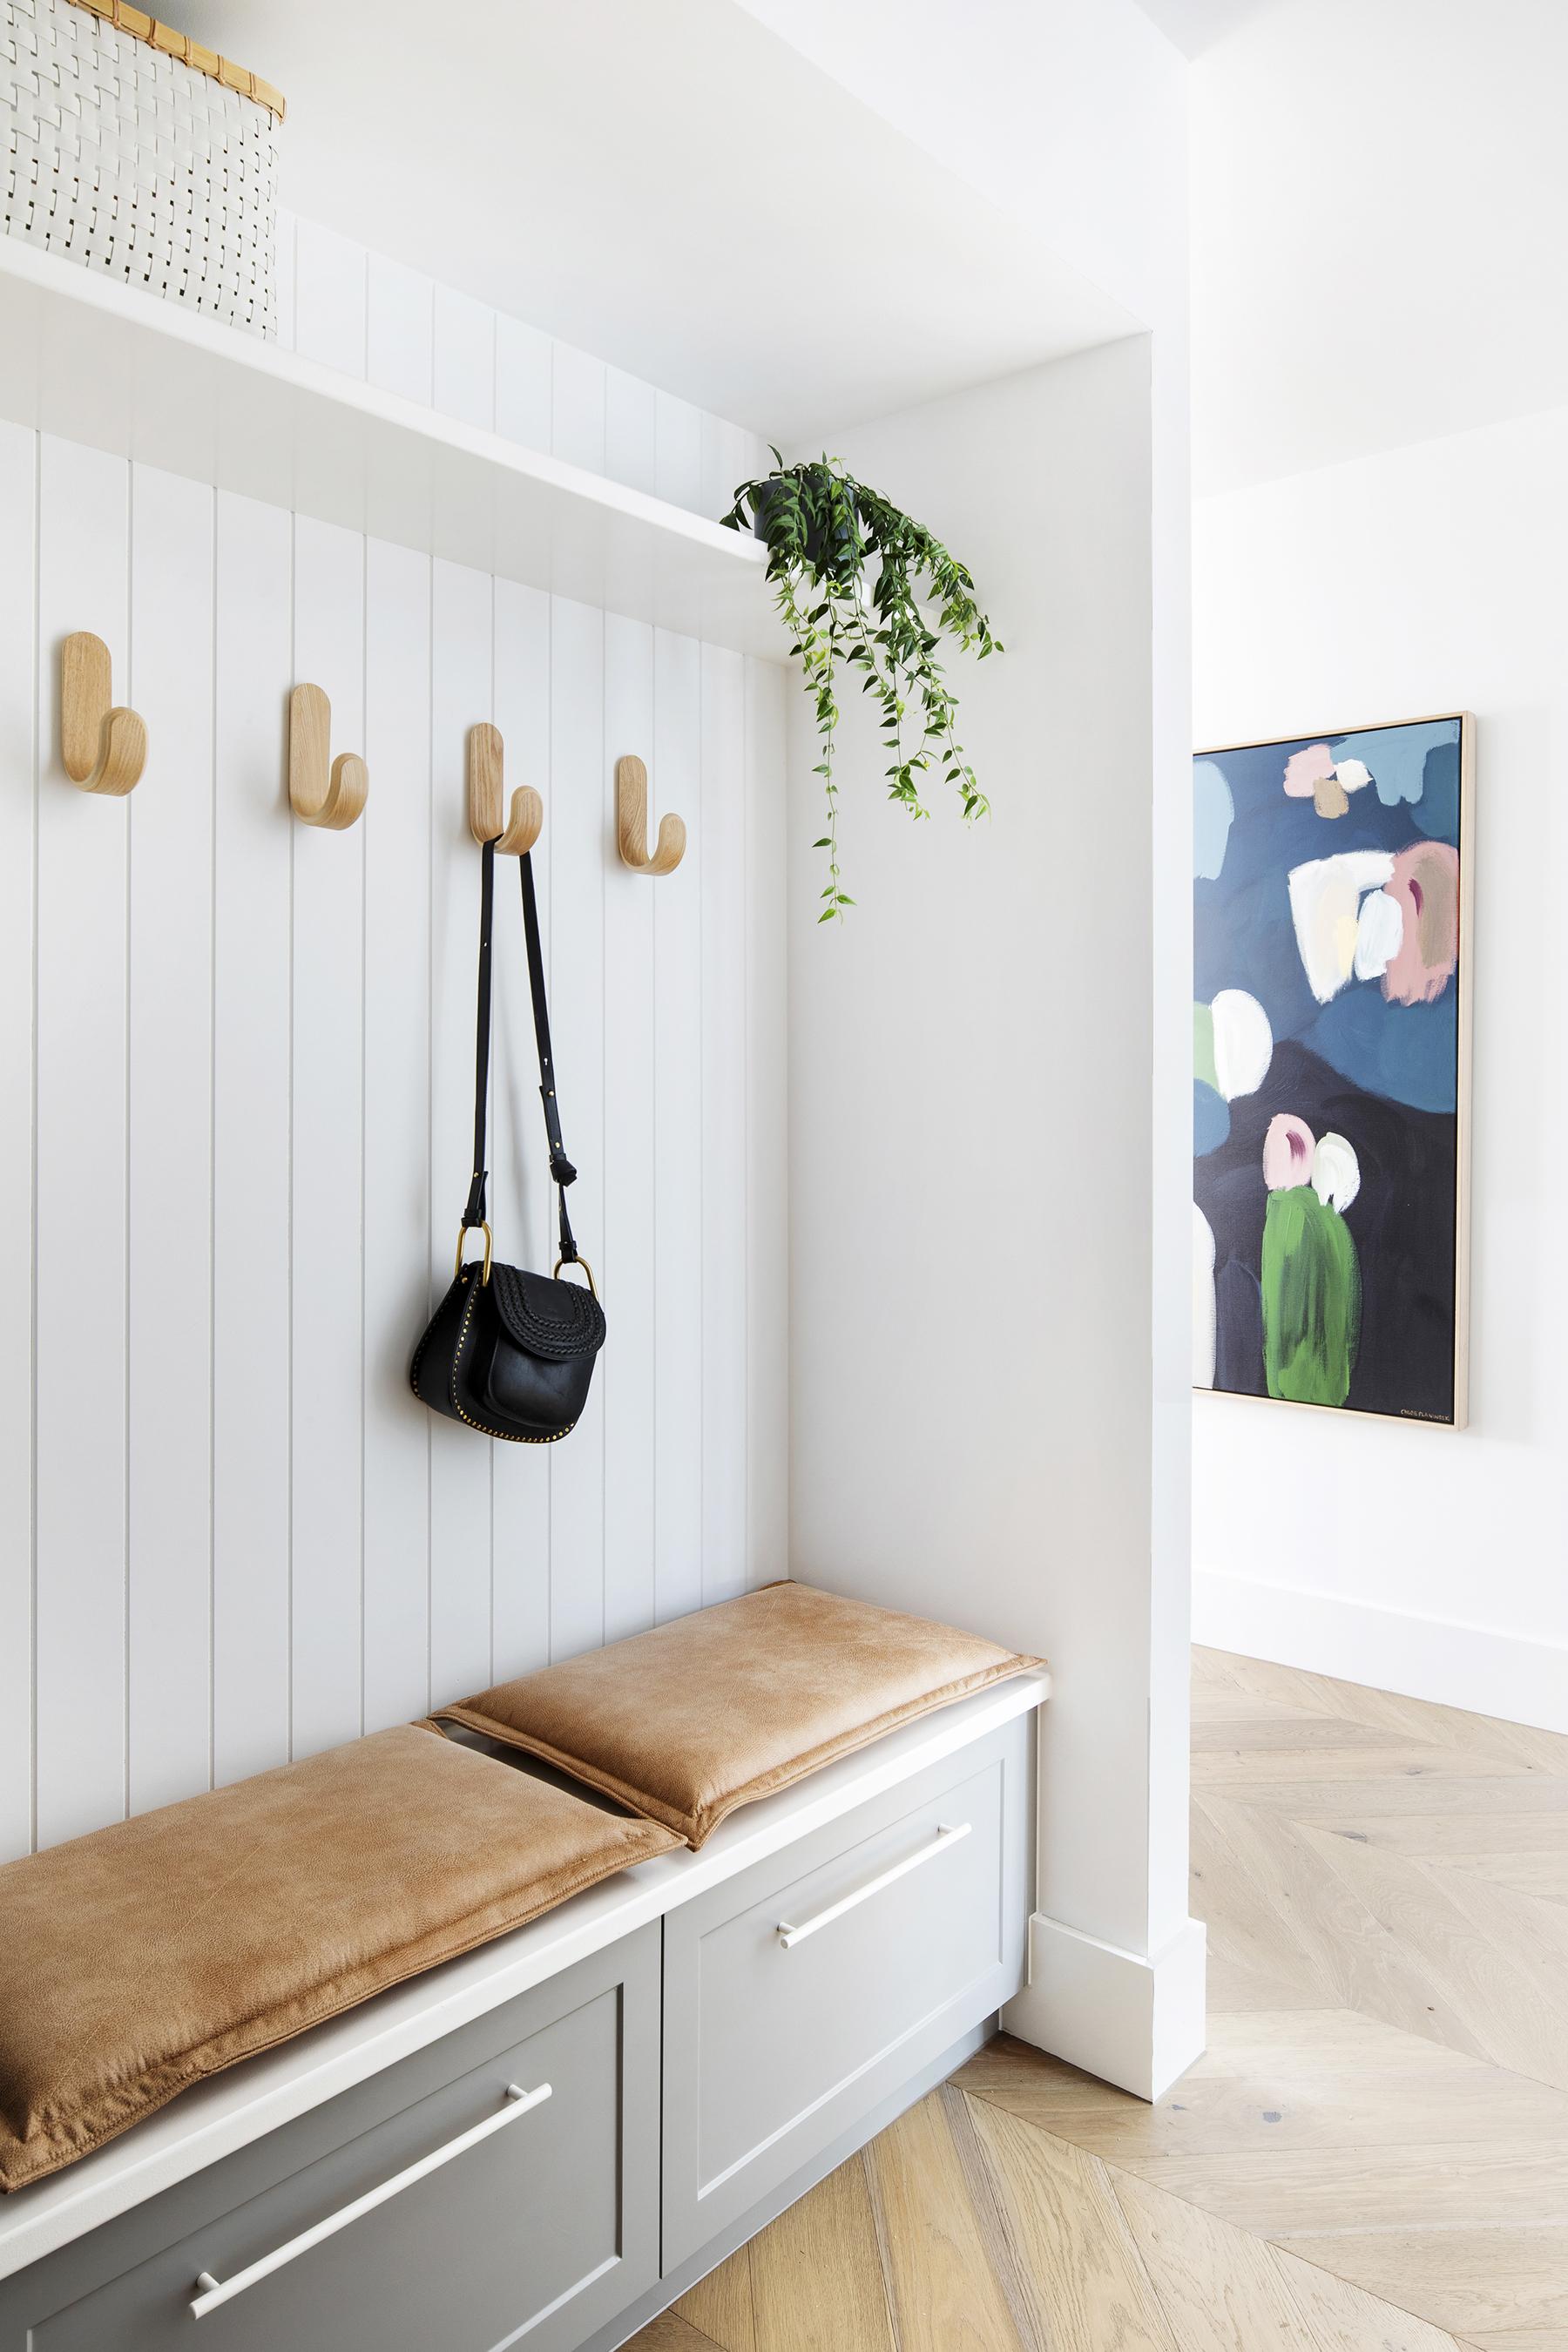 Photography  Dylan Lark, Aspect 11 /  Interior design + styling  Michelle Hart, Bask Interiors